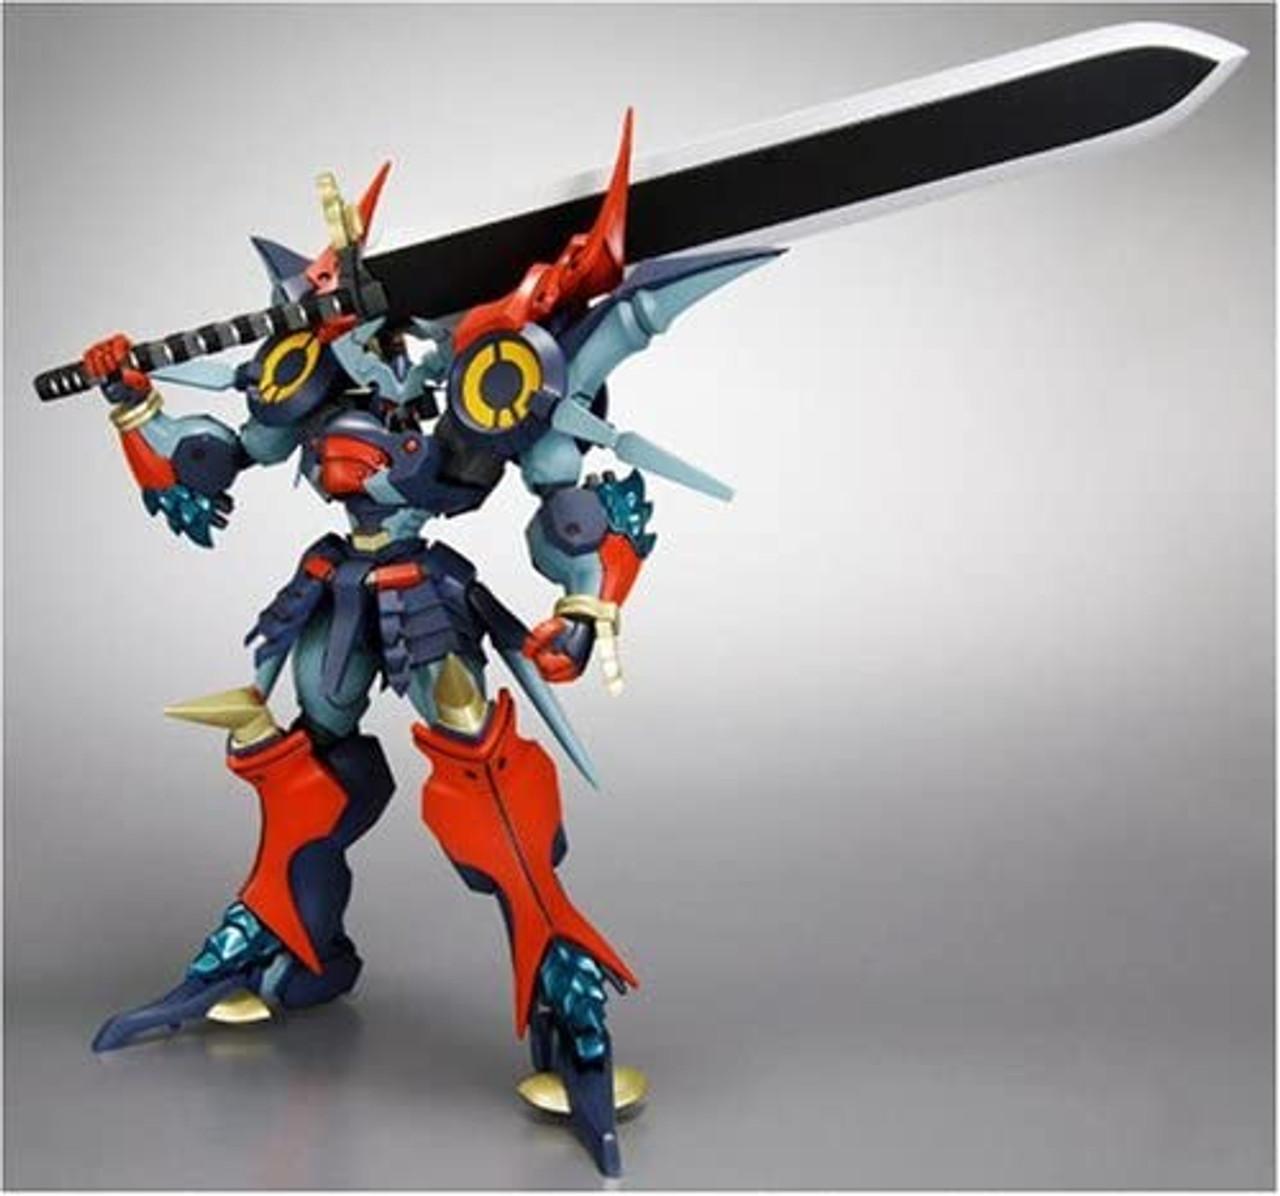 KOTOBUKIYA Super Robot Wars ORIGINAL GENERATION DGG-XAM1 Dygenguar Non-scale Plastic Kit